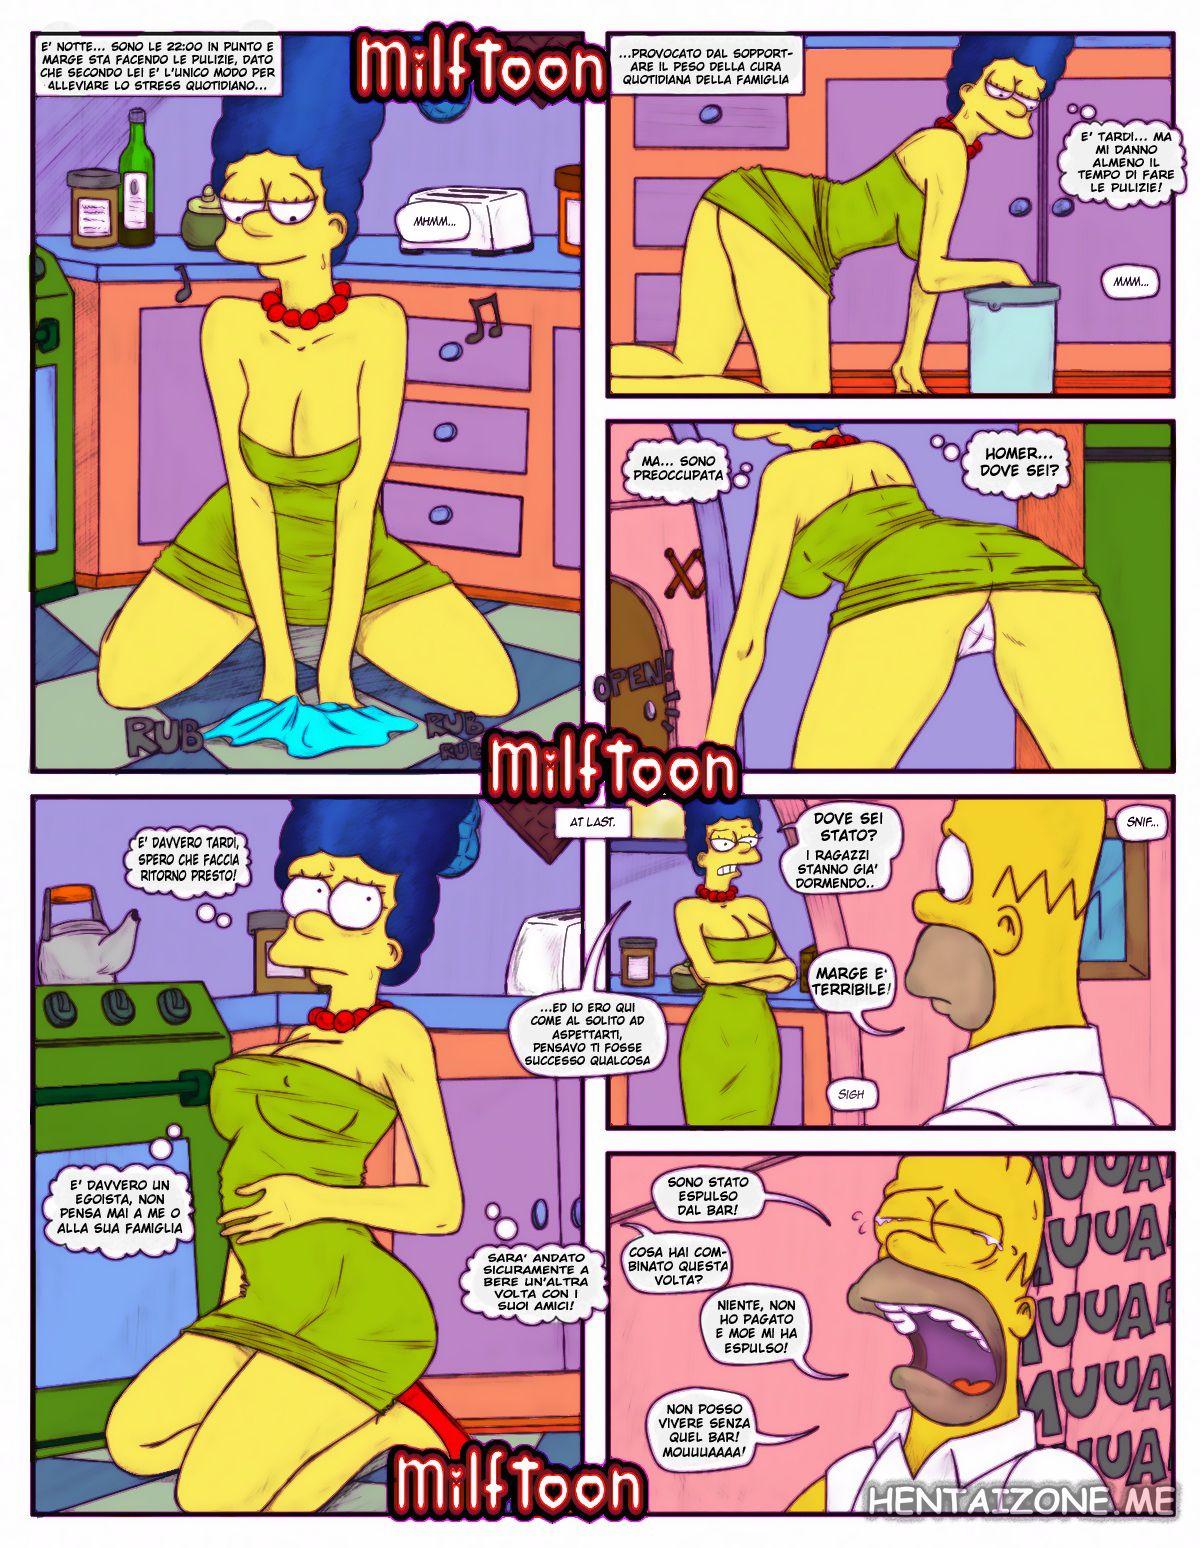 simposn marge pulisce la cucina quasi nuda sexy marge fa vedere le mutandine e le tette hentai marge simpson hentai porno milf full color